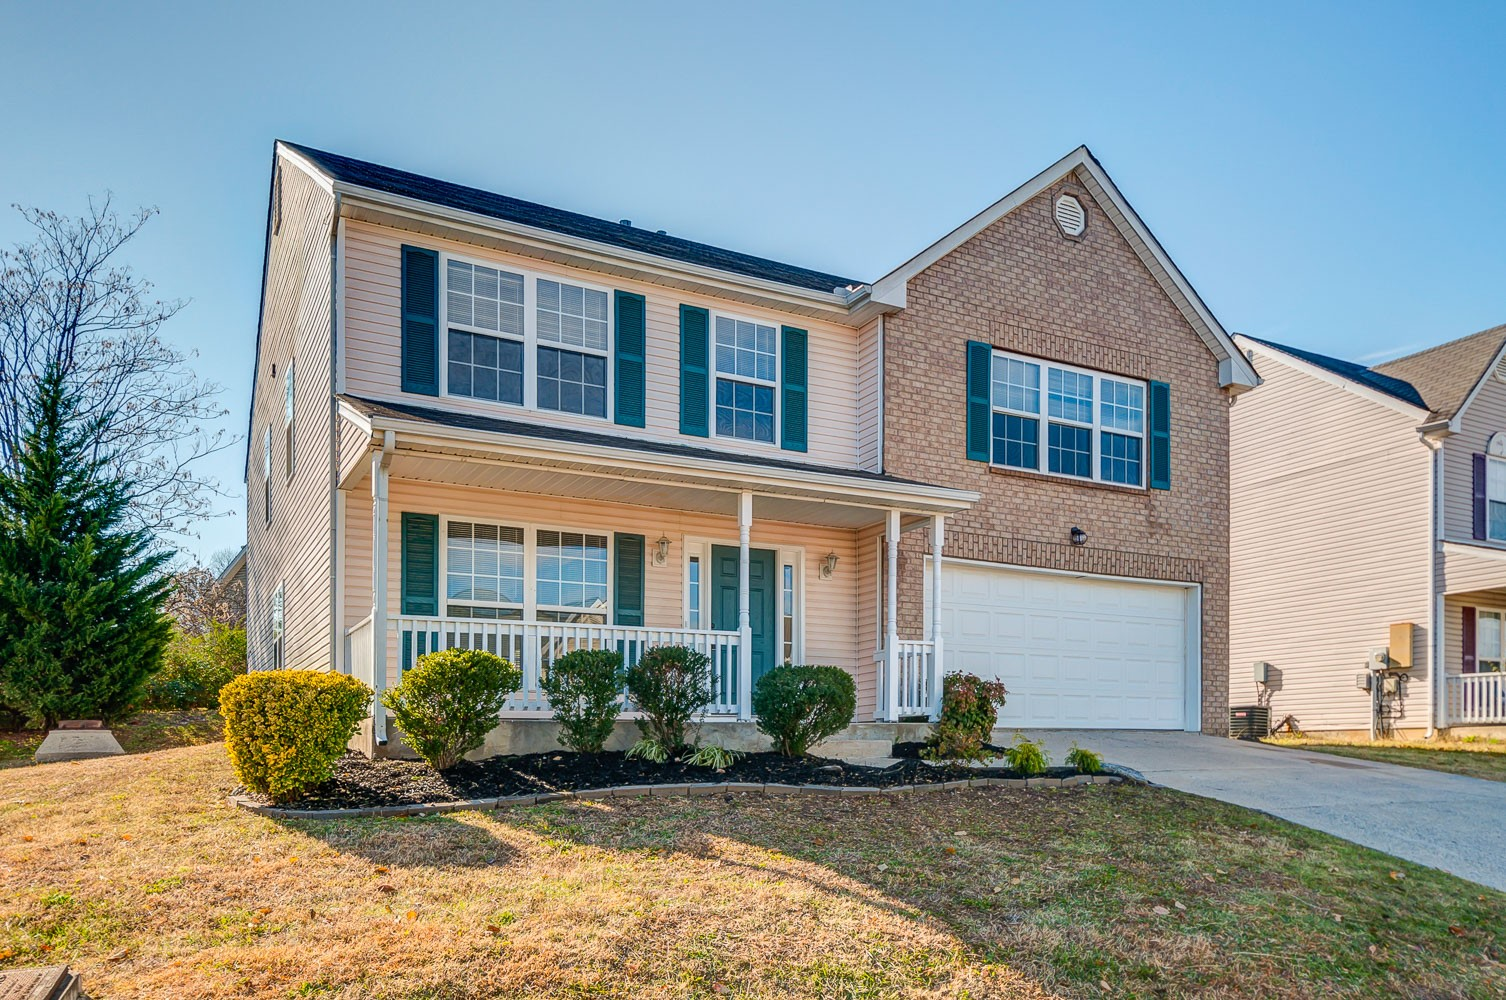 4208 Sandstone Dr, Antioch, TN 37013 - Antioch, TN real estate listing